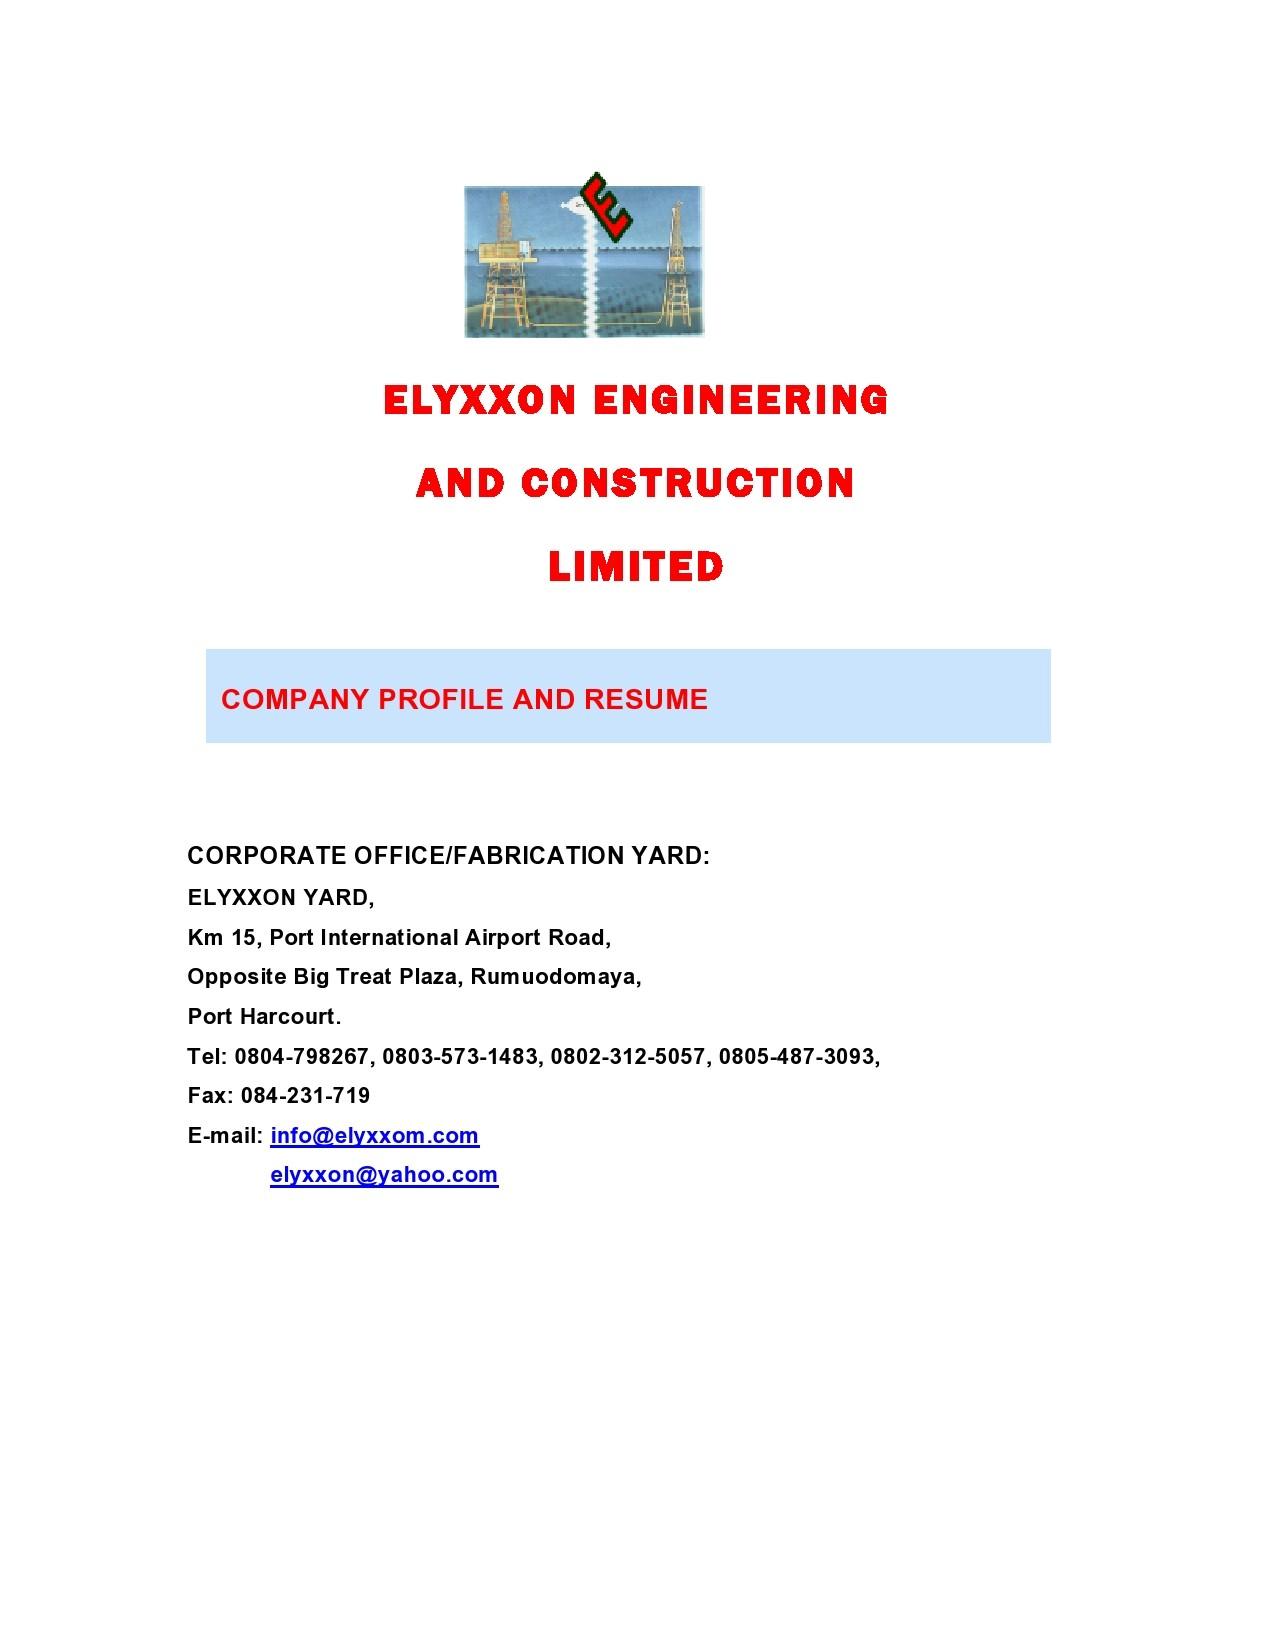 Free company profile template 20